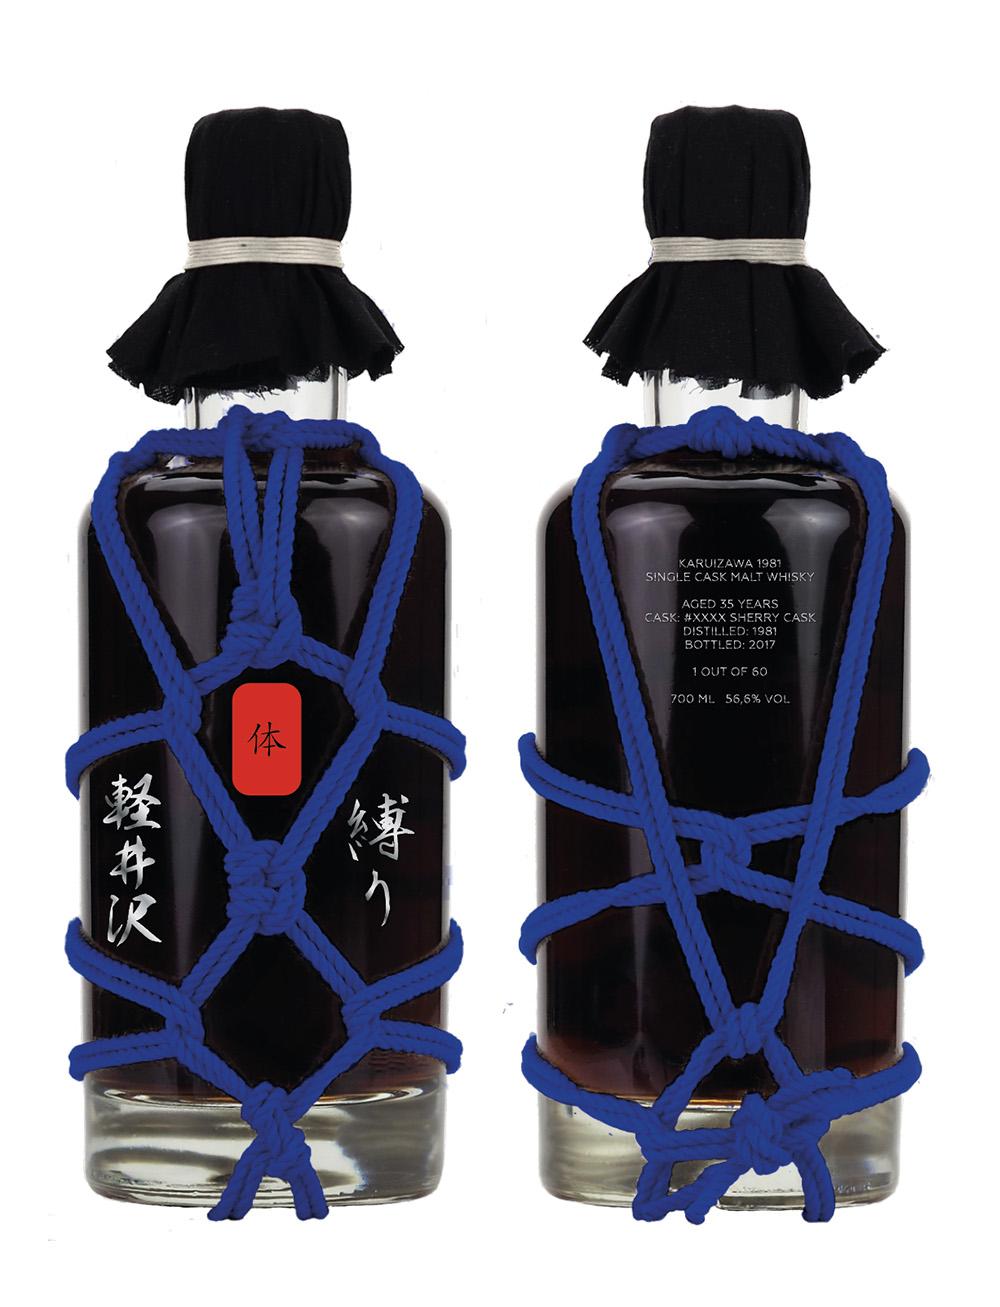 Karuizawa 35 Year Old Shibari Japanese Whisky Blue Edition